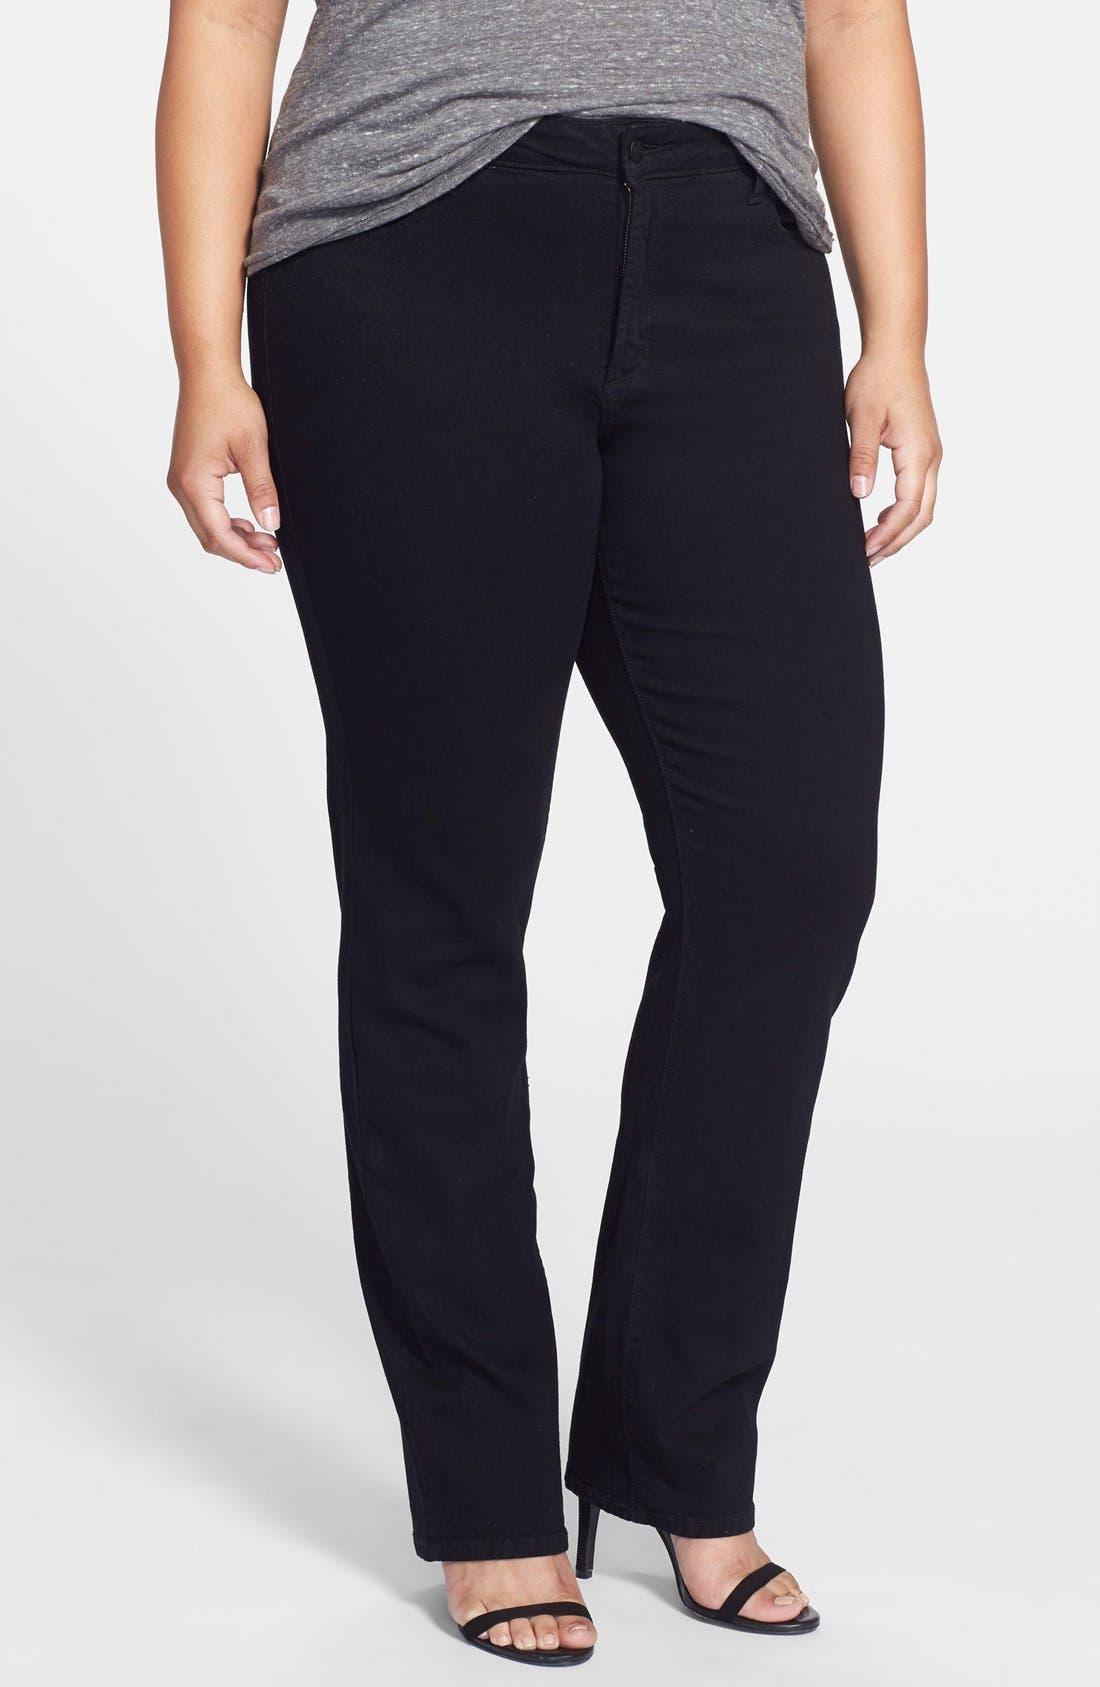 Main Image - NYDJ 'Marilyn' Stretch Straight Leg Jeans (Black) (Plus Size)